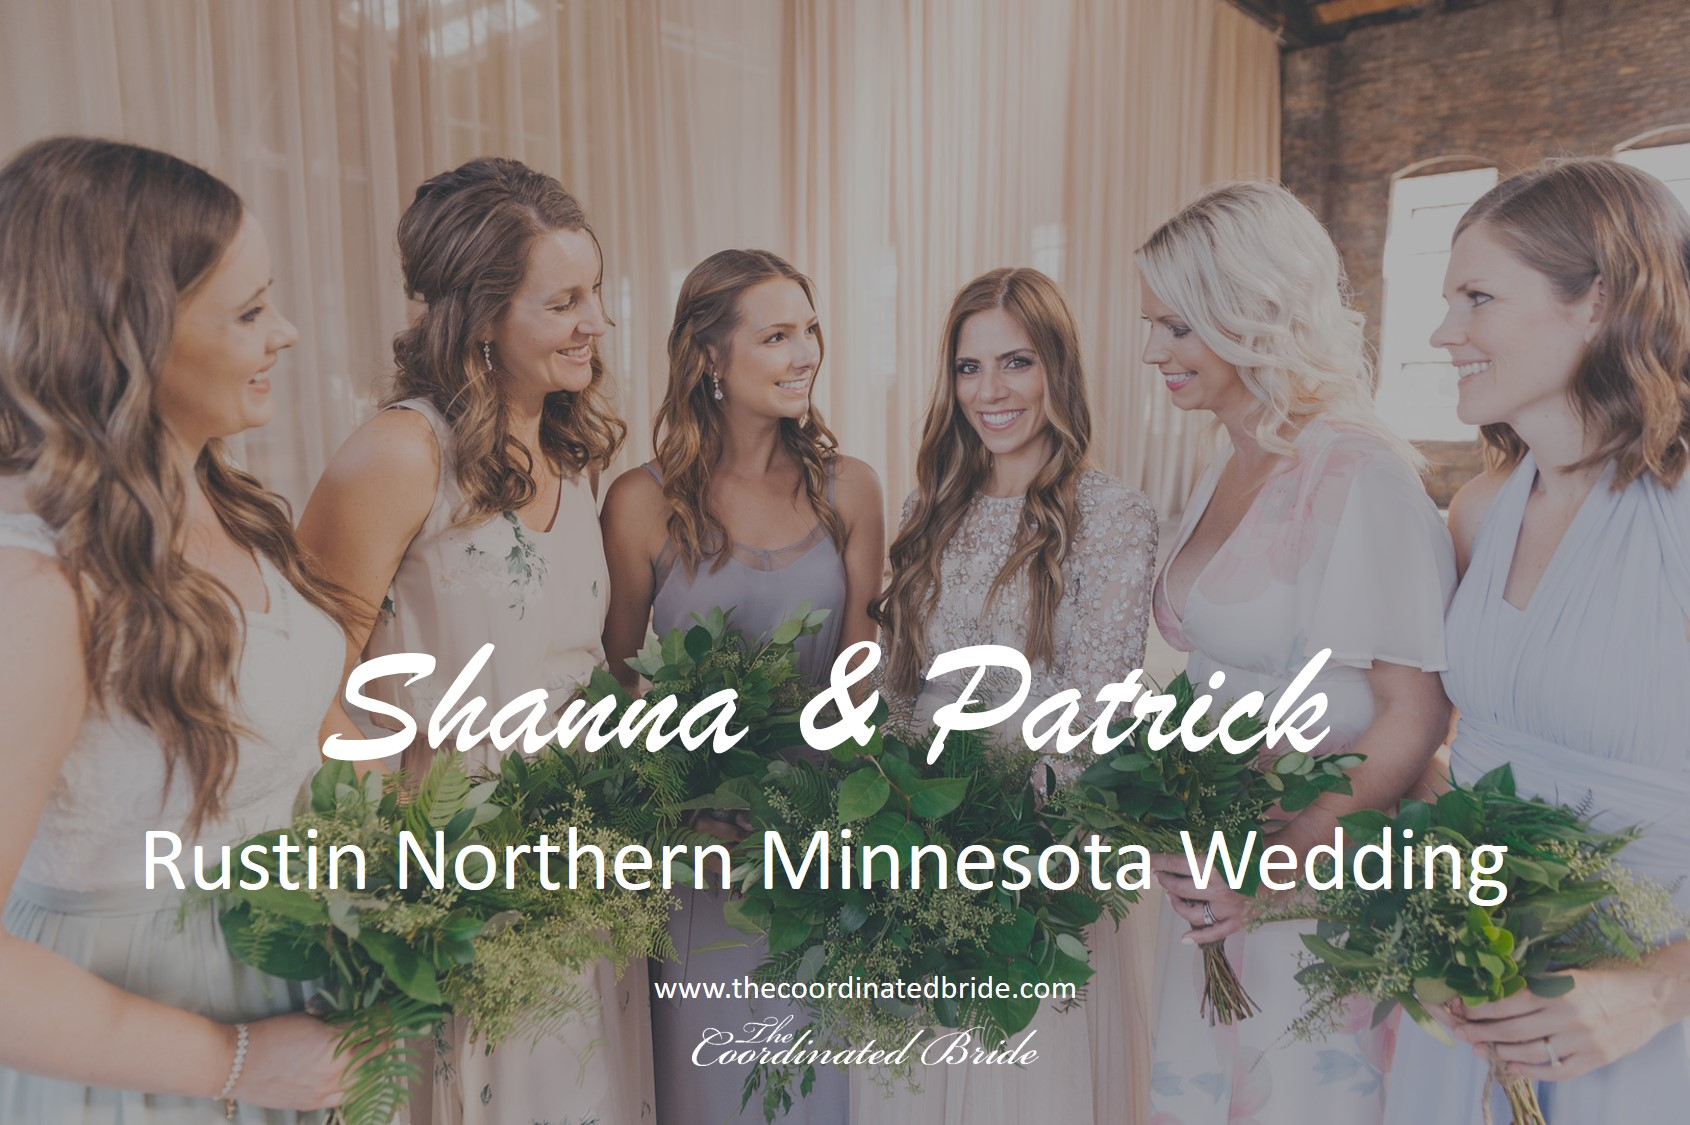 An Urban Rustic Minnesota Wedding, Shanna & Patrick